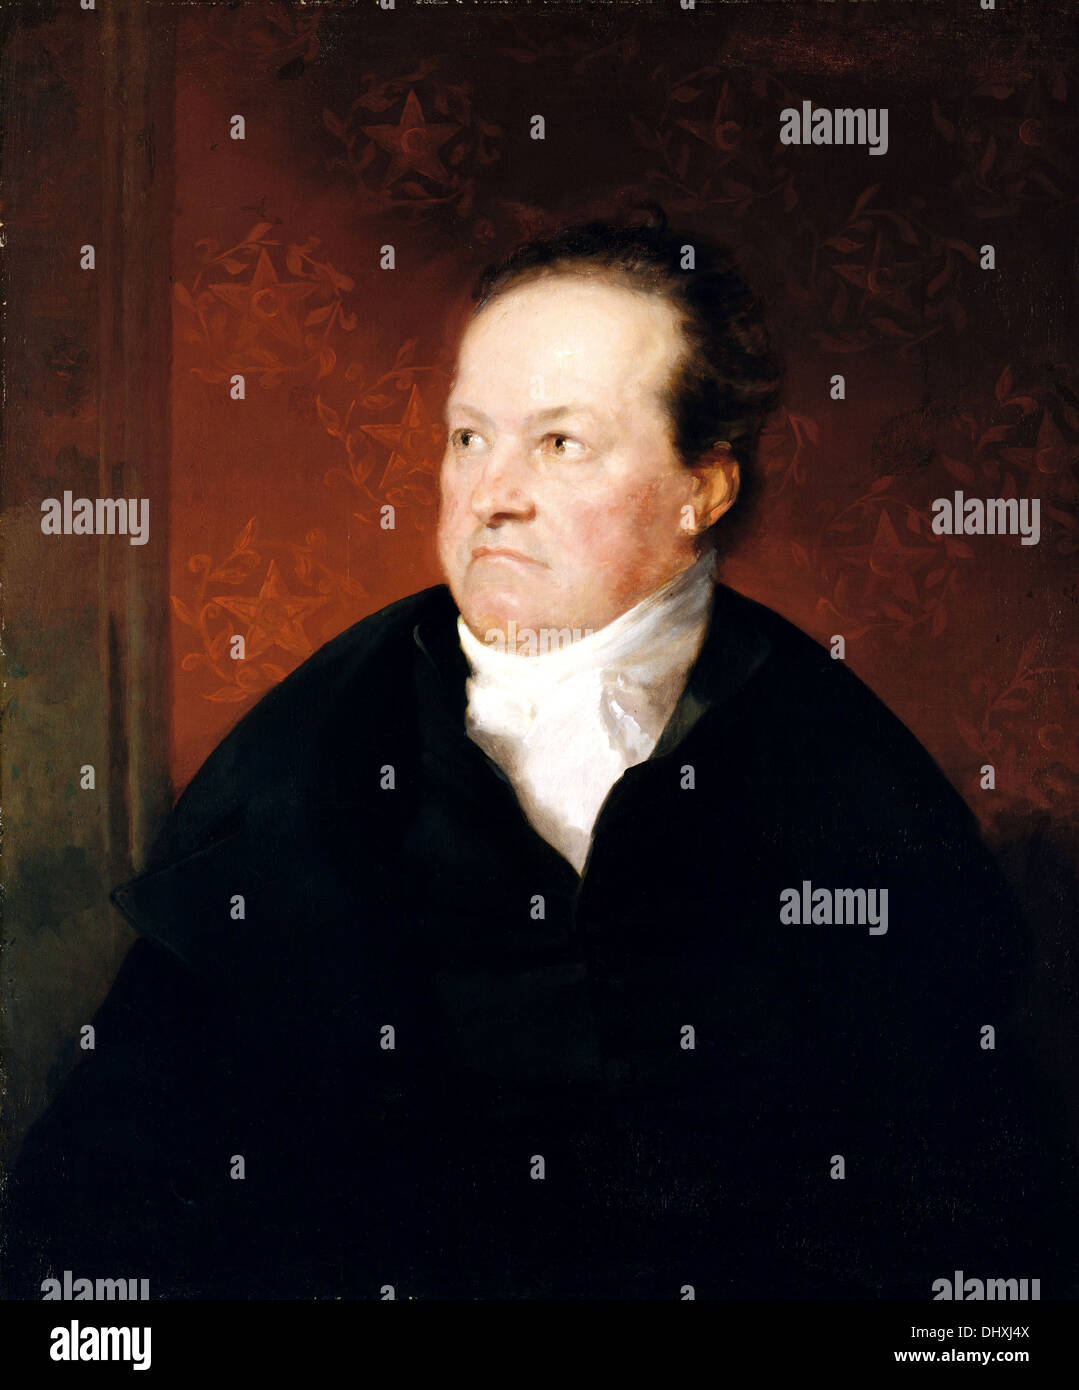 DeWitt Clinton - by Samuel F. B. Morse 1826 - Stock Image